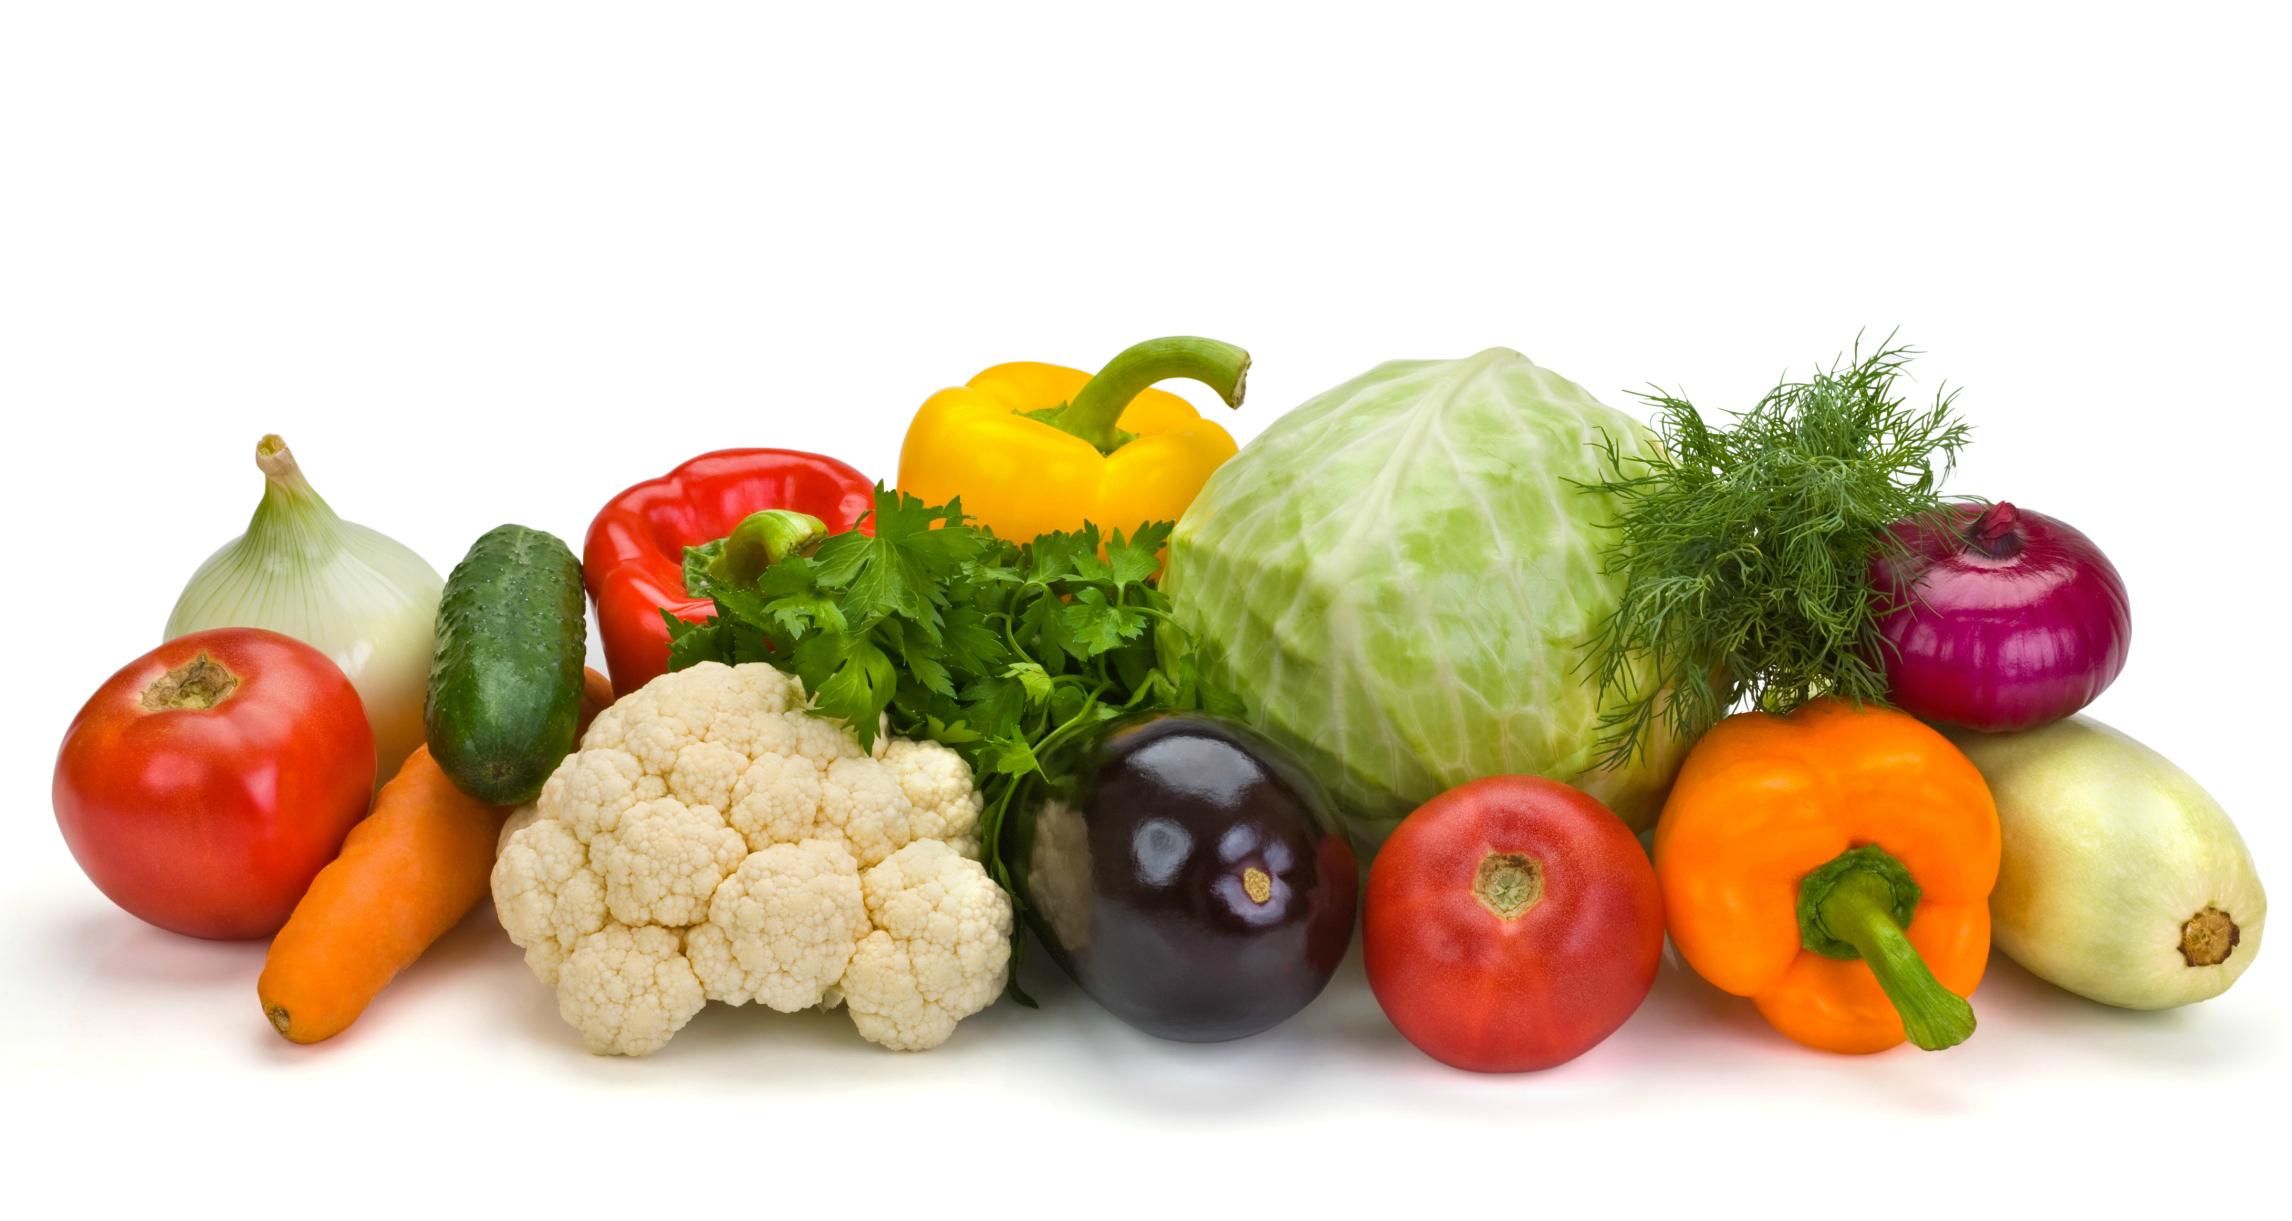 HQ Vegetables Wallpapers | File 873.27Kb